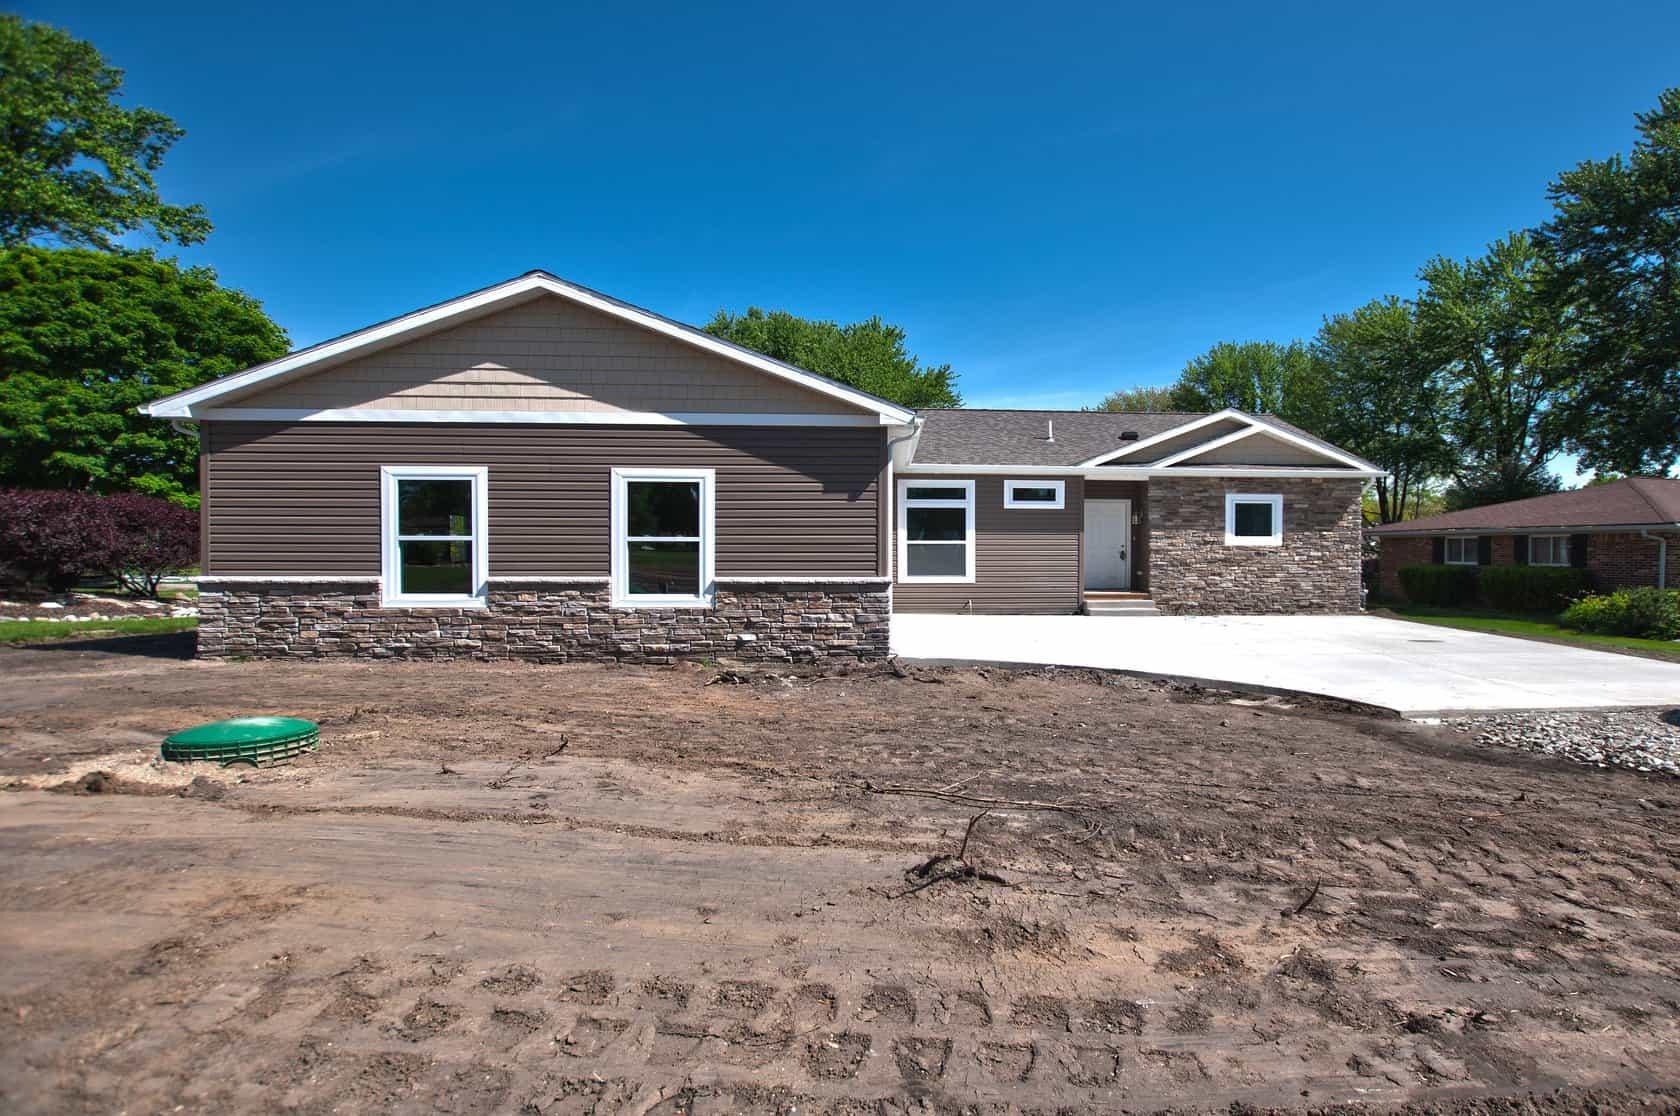 custom ranch modular home leesburg indiana wildwood ranch 28 next modular. Black Bedroom Furniture Sets. Home Design Ideas